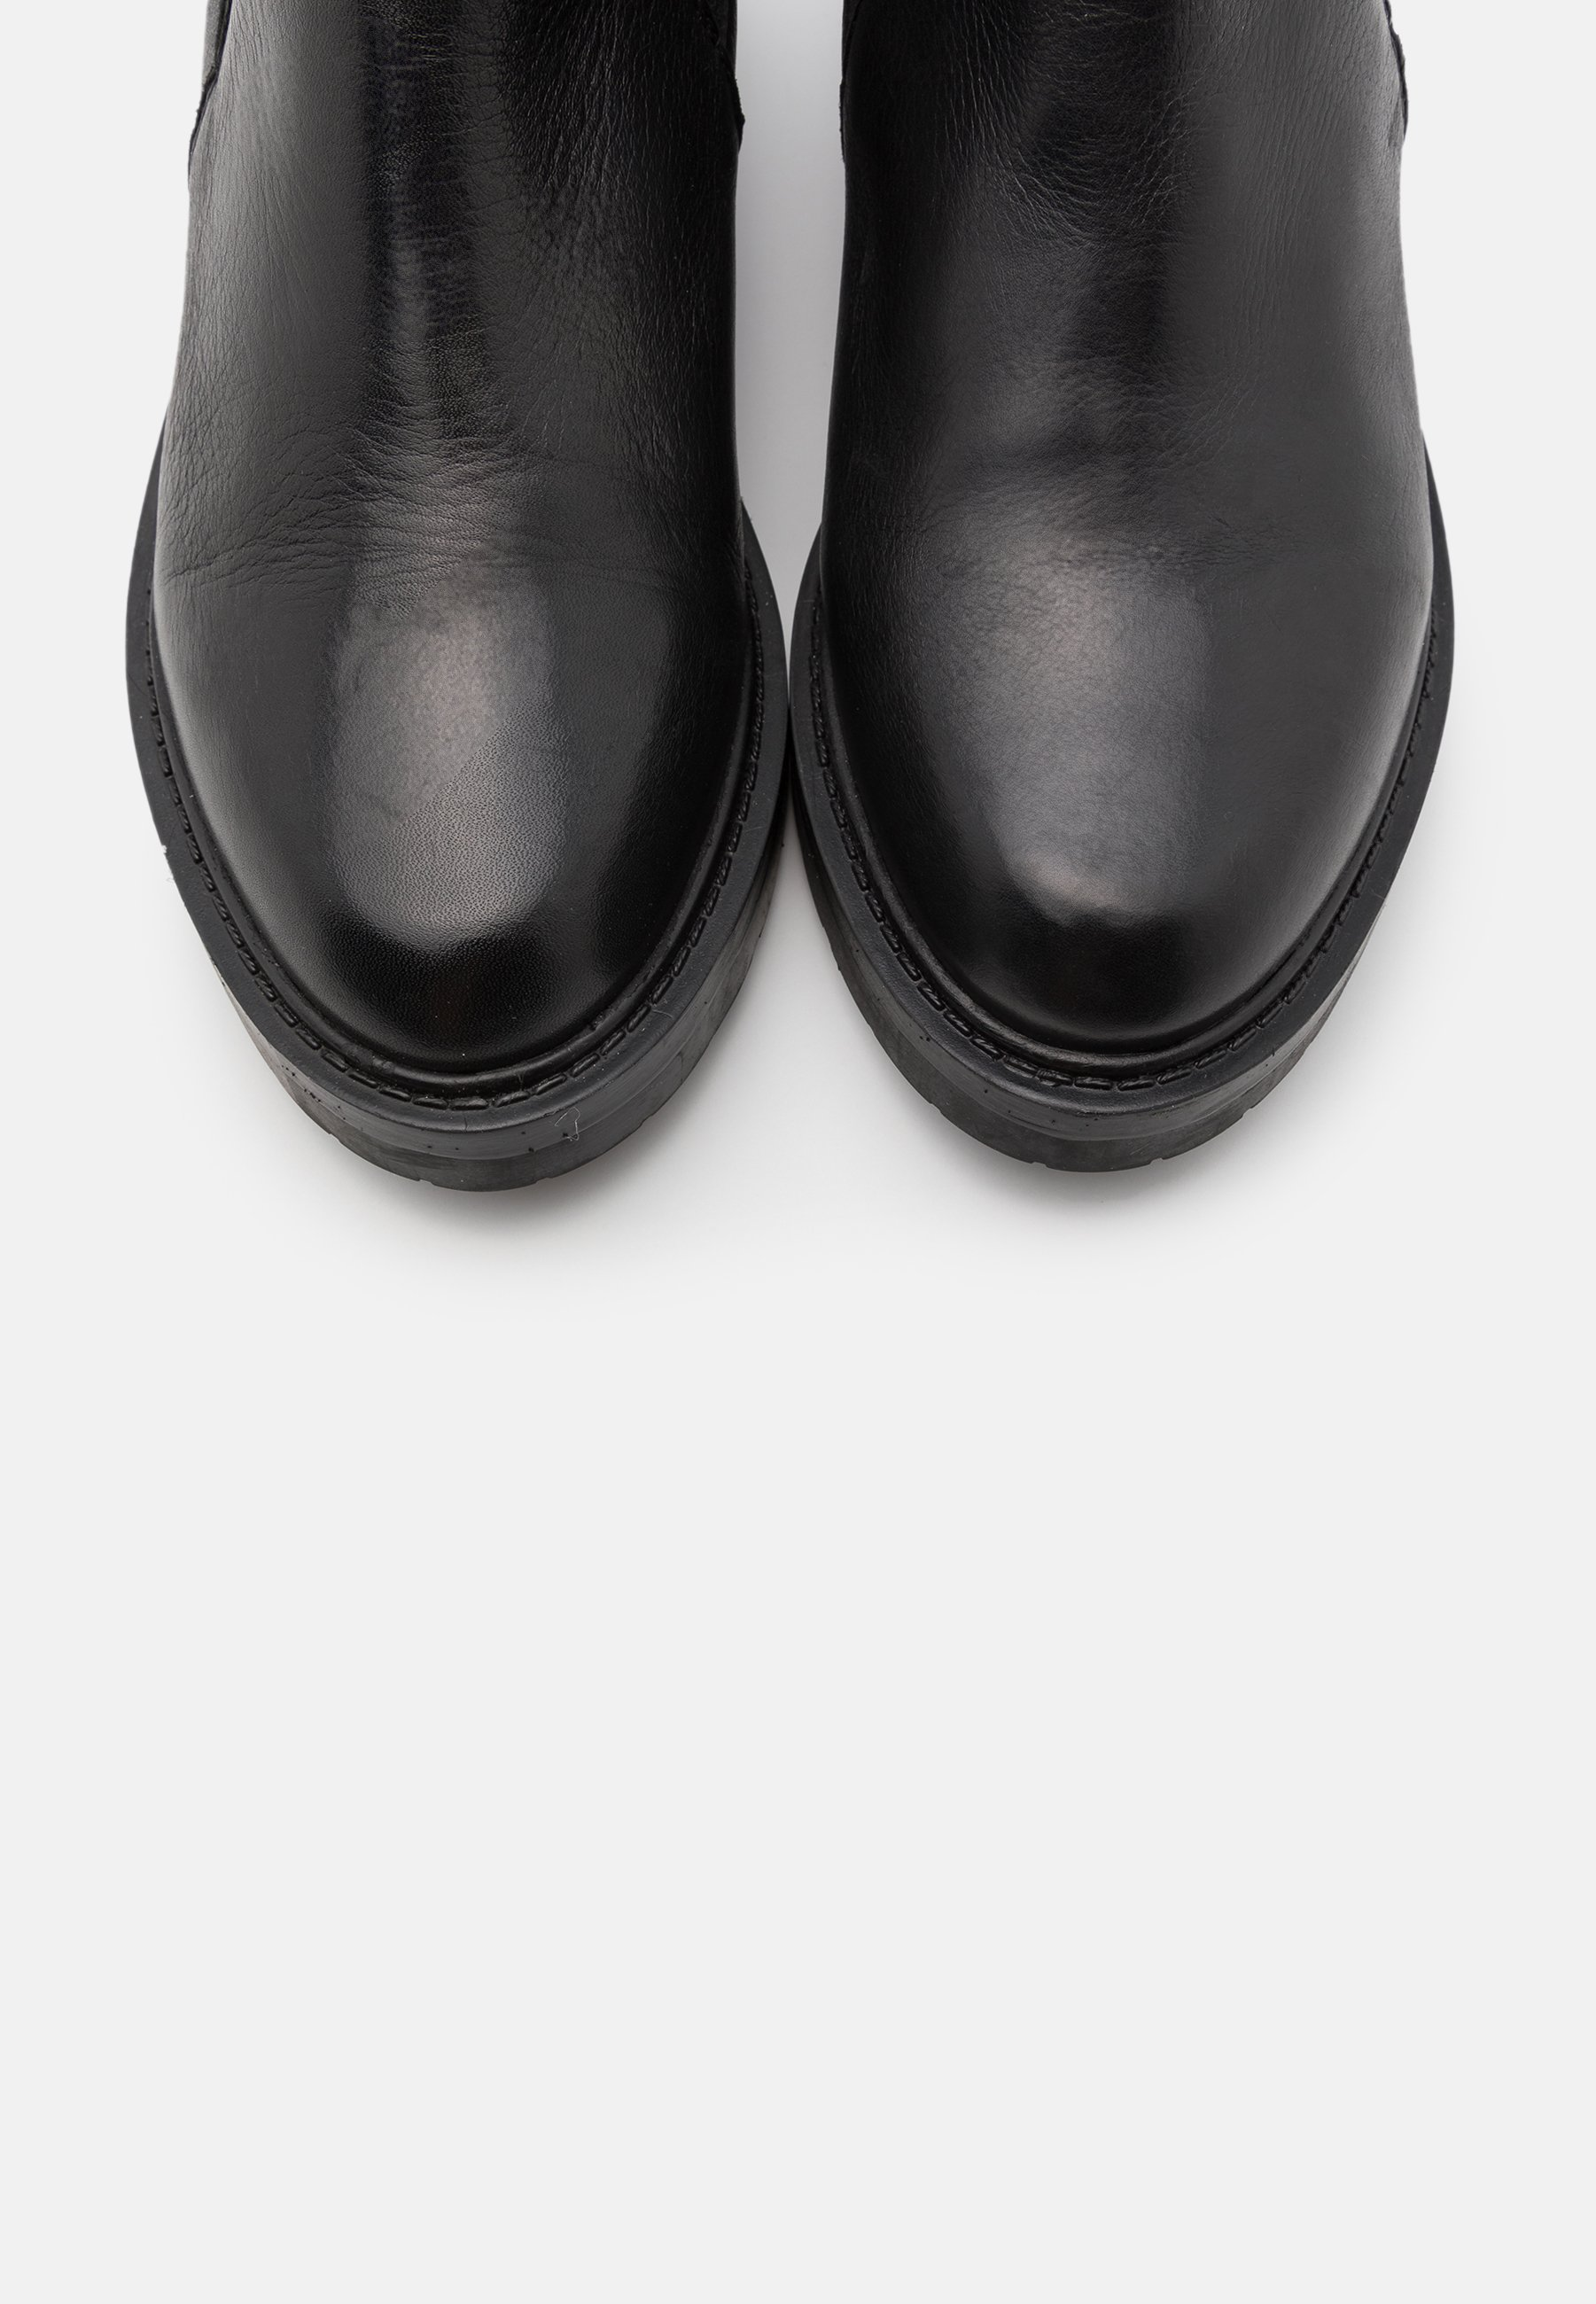 JEMMA LONG Korte laarzen black garda